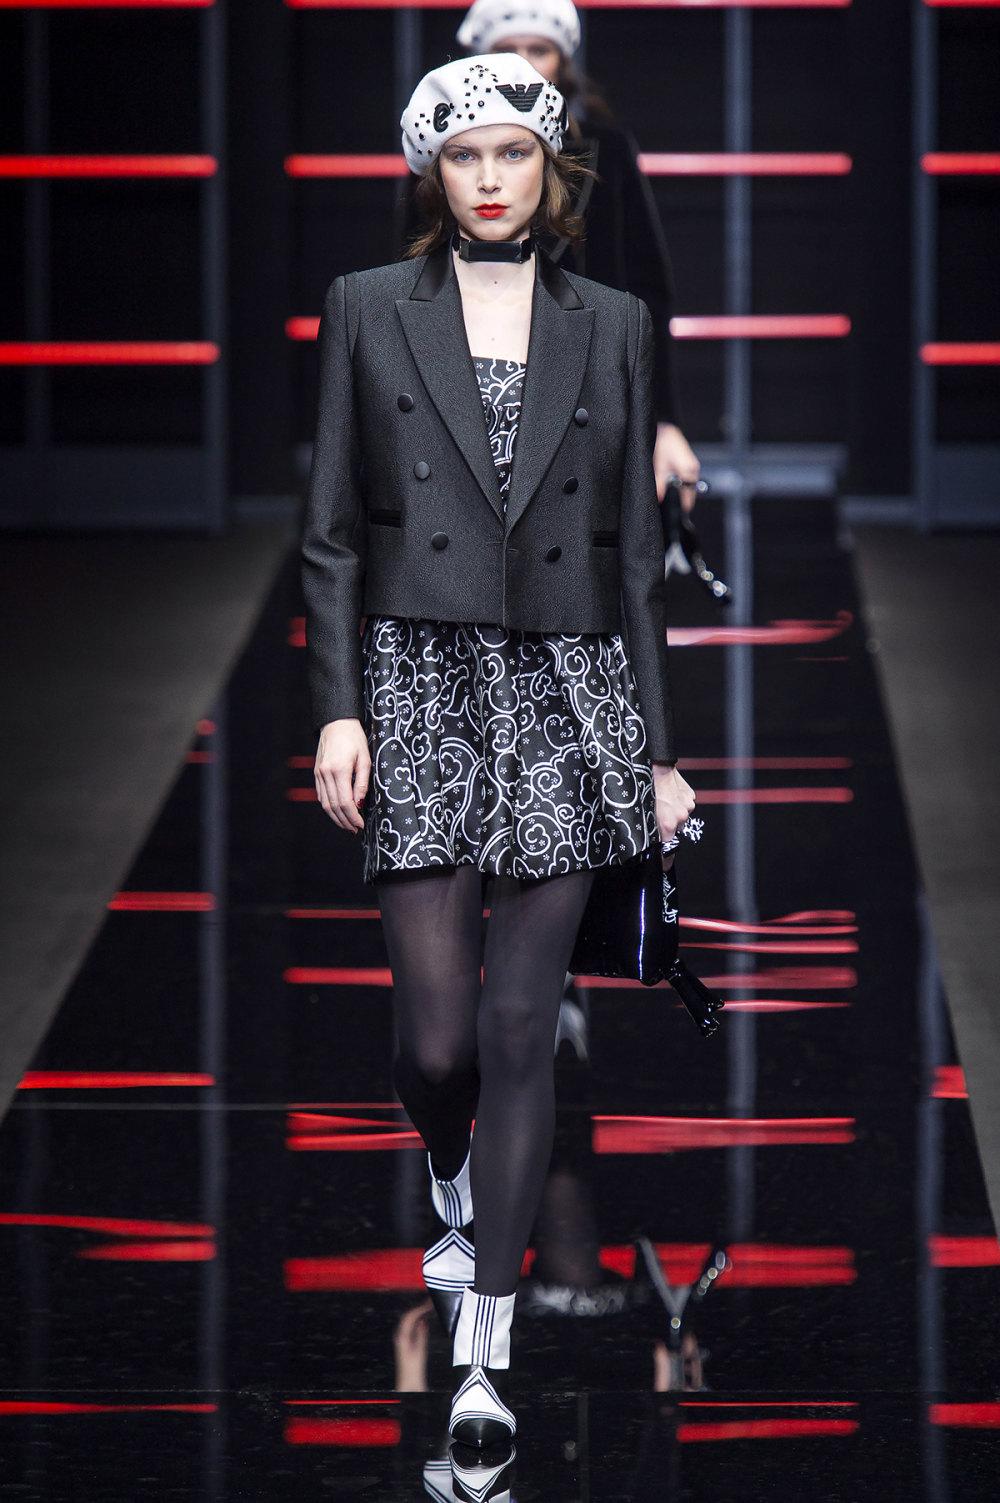 Emporio Armani时装系列畅的裤子带有柔滑裙子的鸡尾酒礼服-29.jpg